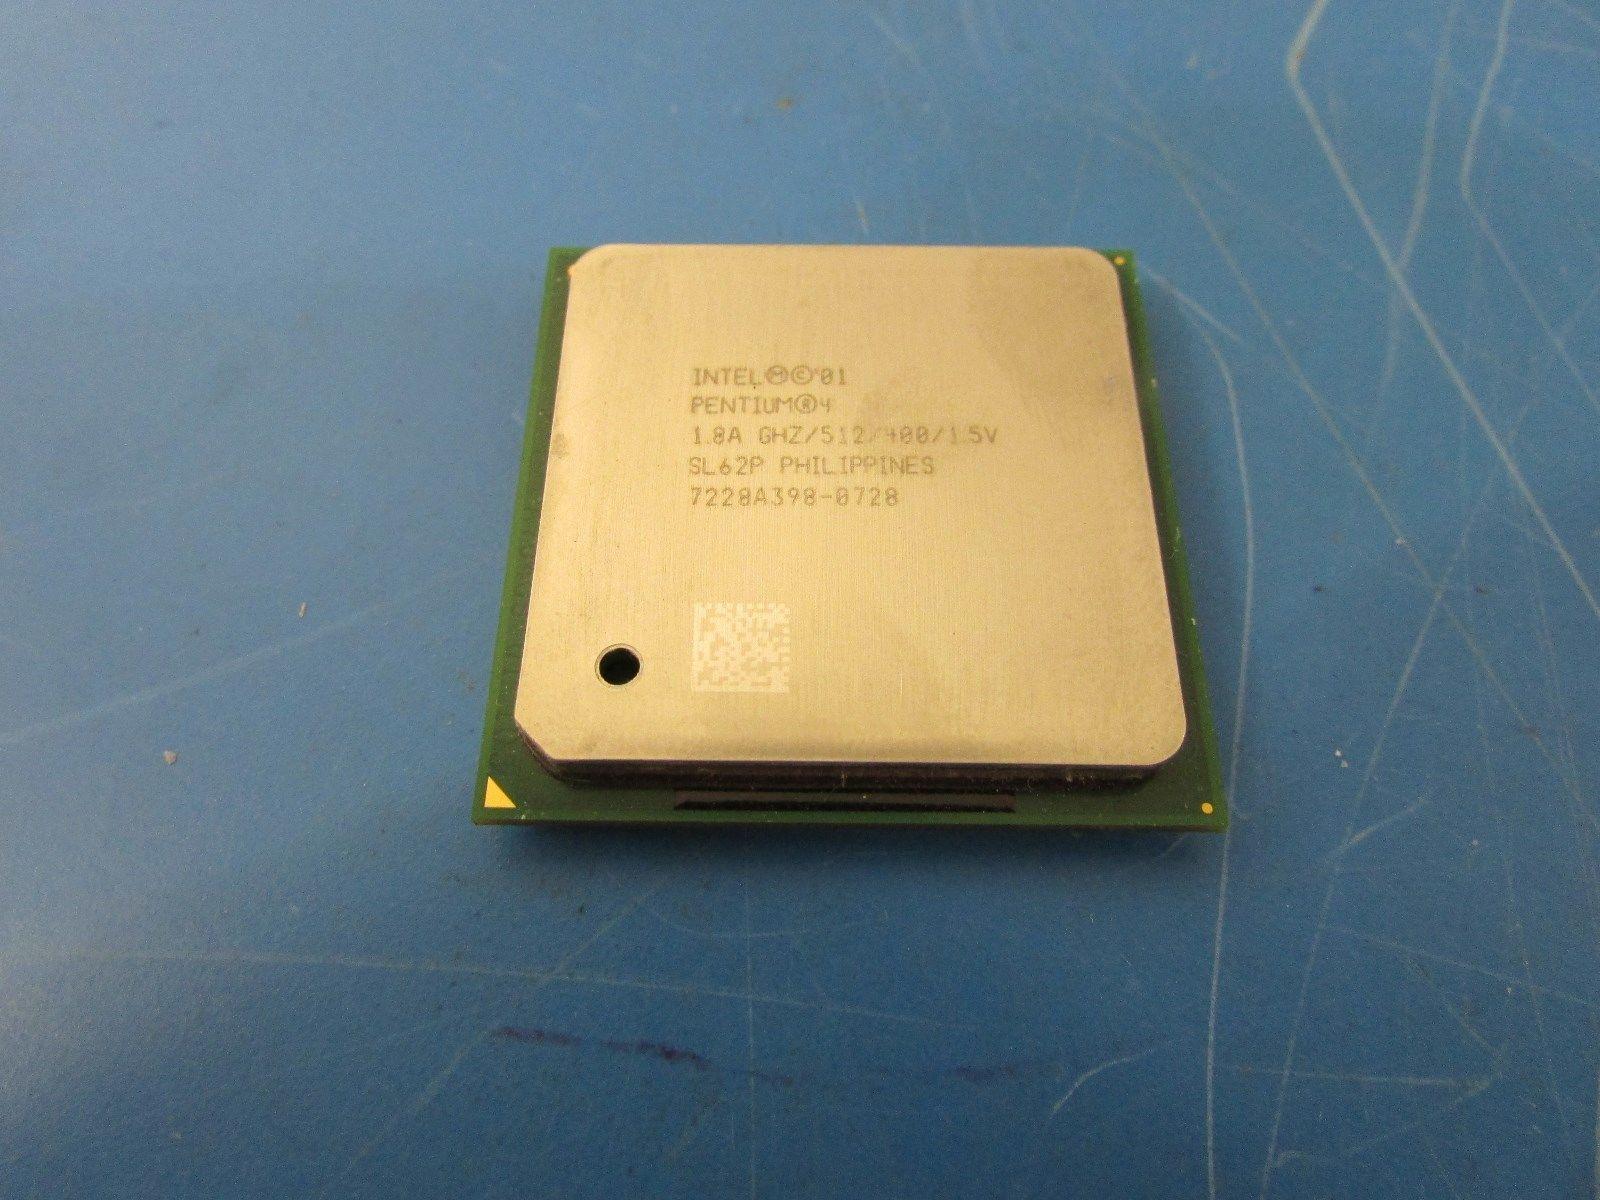 Intel Pentium 4 18a Ghz 512 400 Sl63x And 18 Similar Items Processor Socket 478